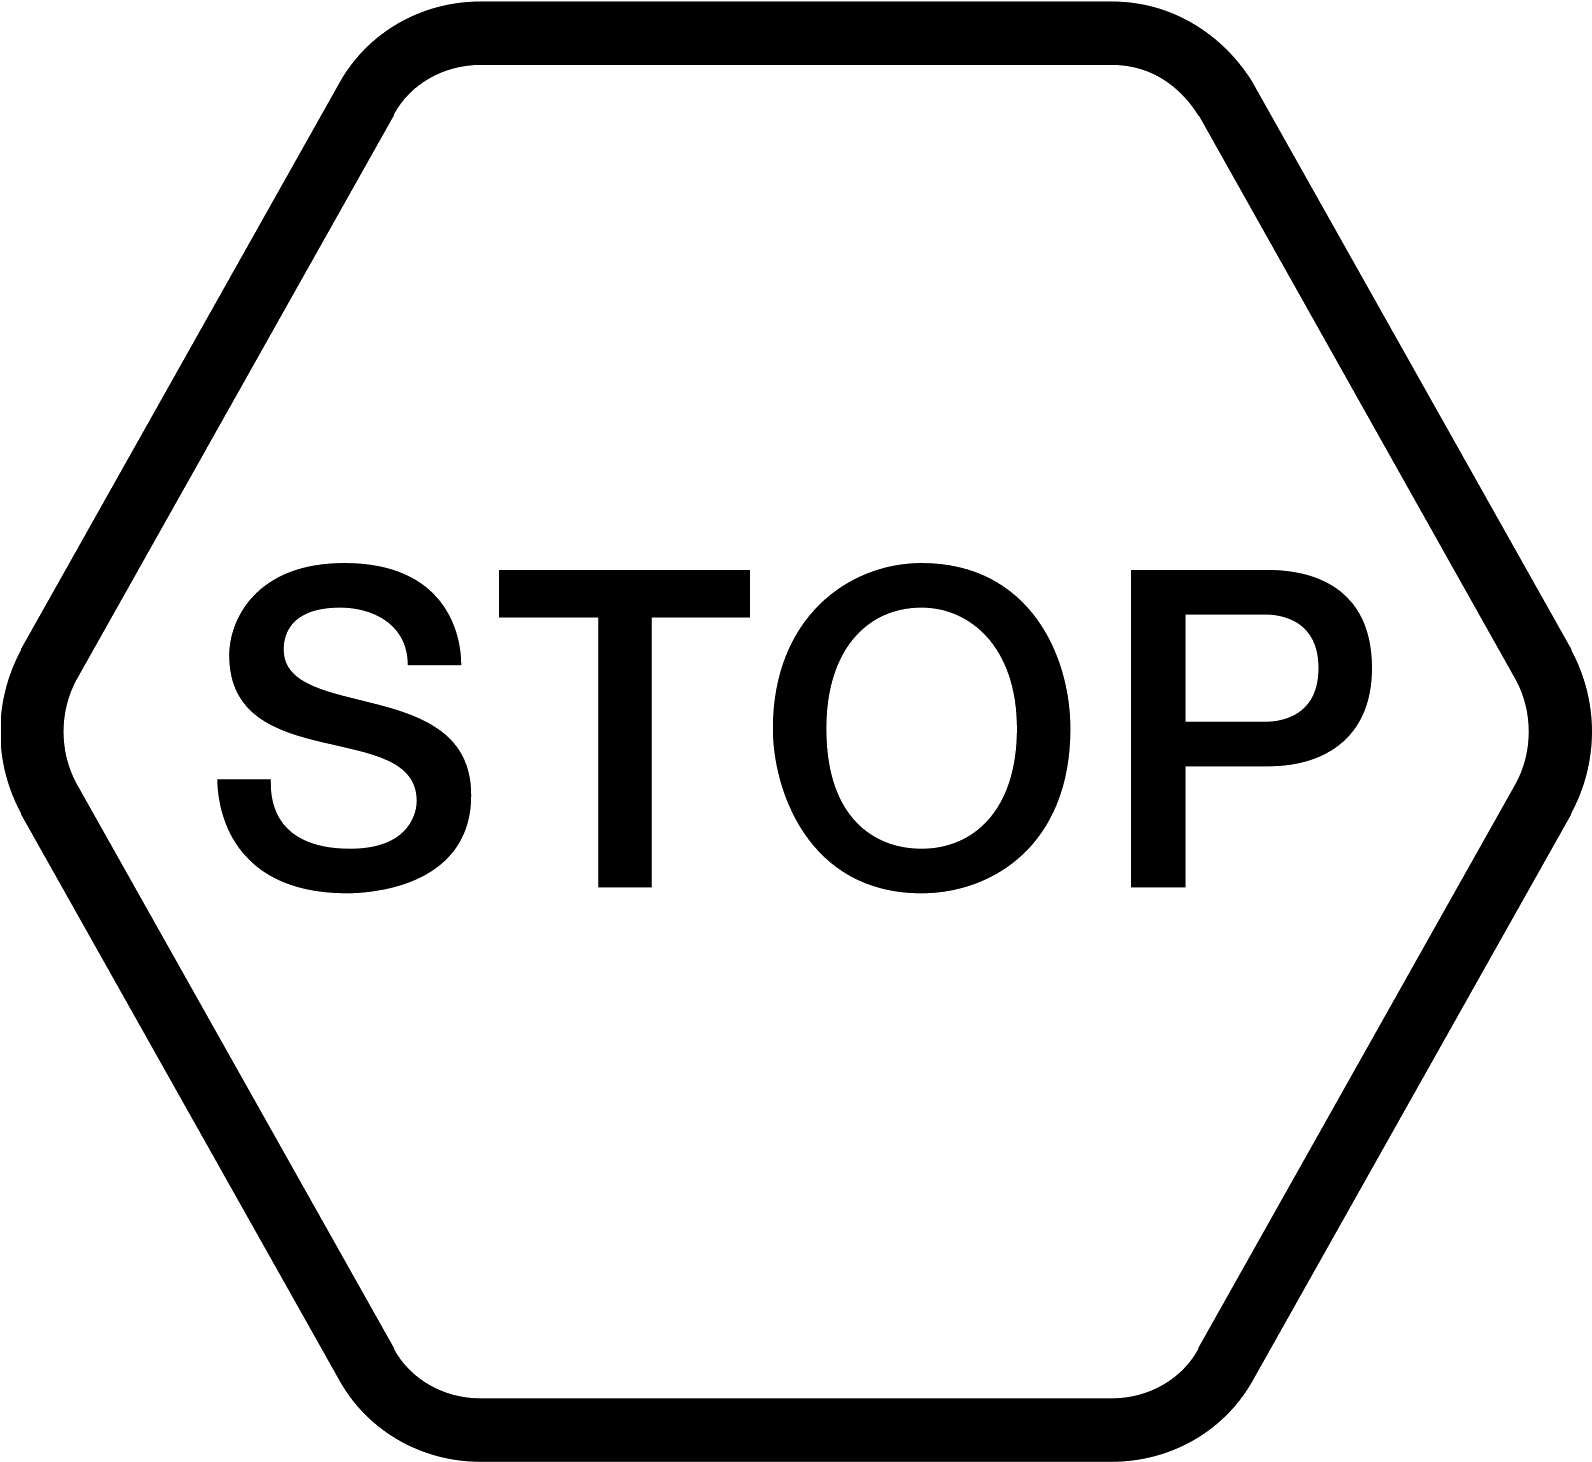 Download HD Panneau Stop Icon.